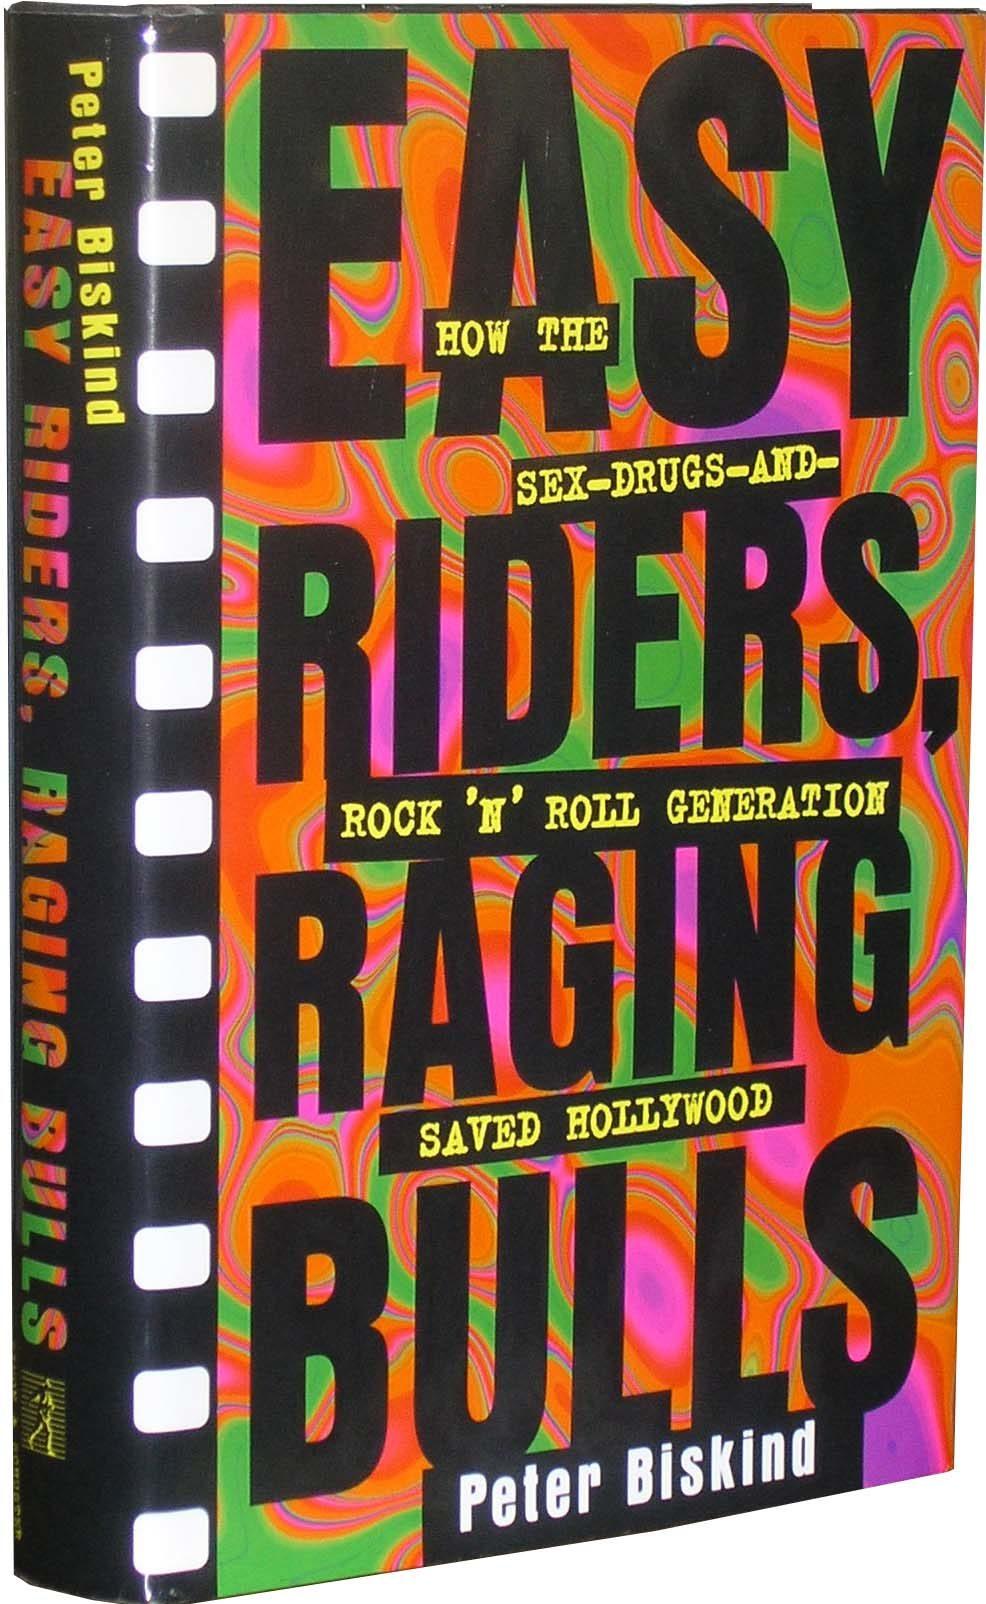 Easy Riders, Raging Bulls book cover - thescriptblog.com